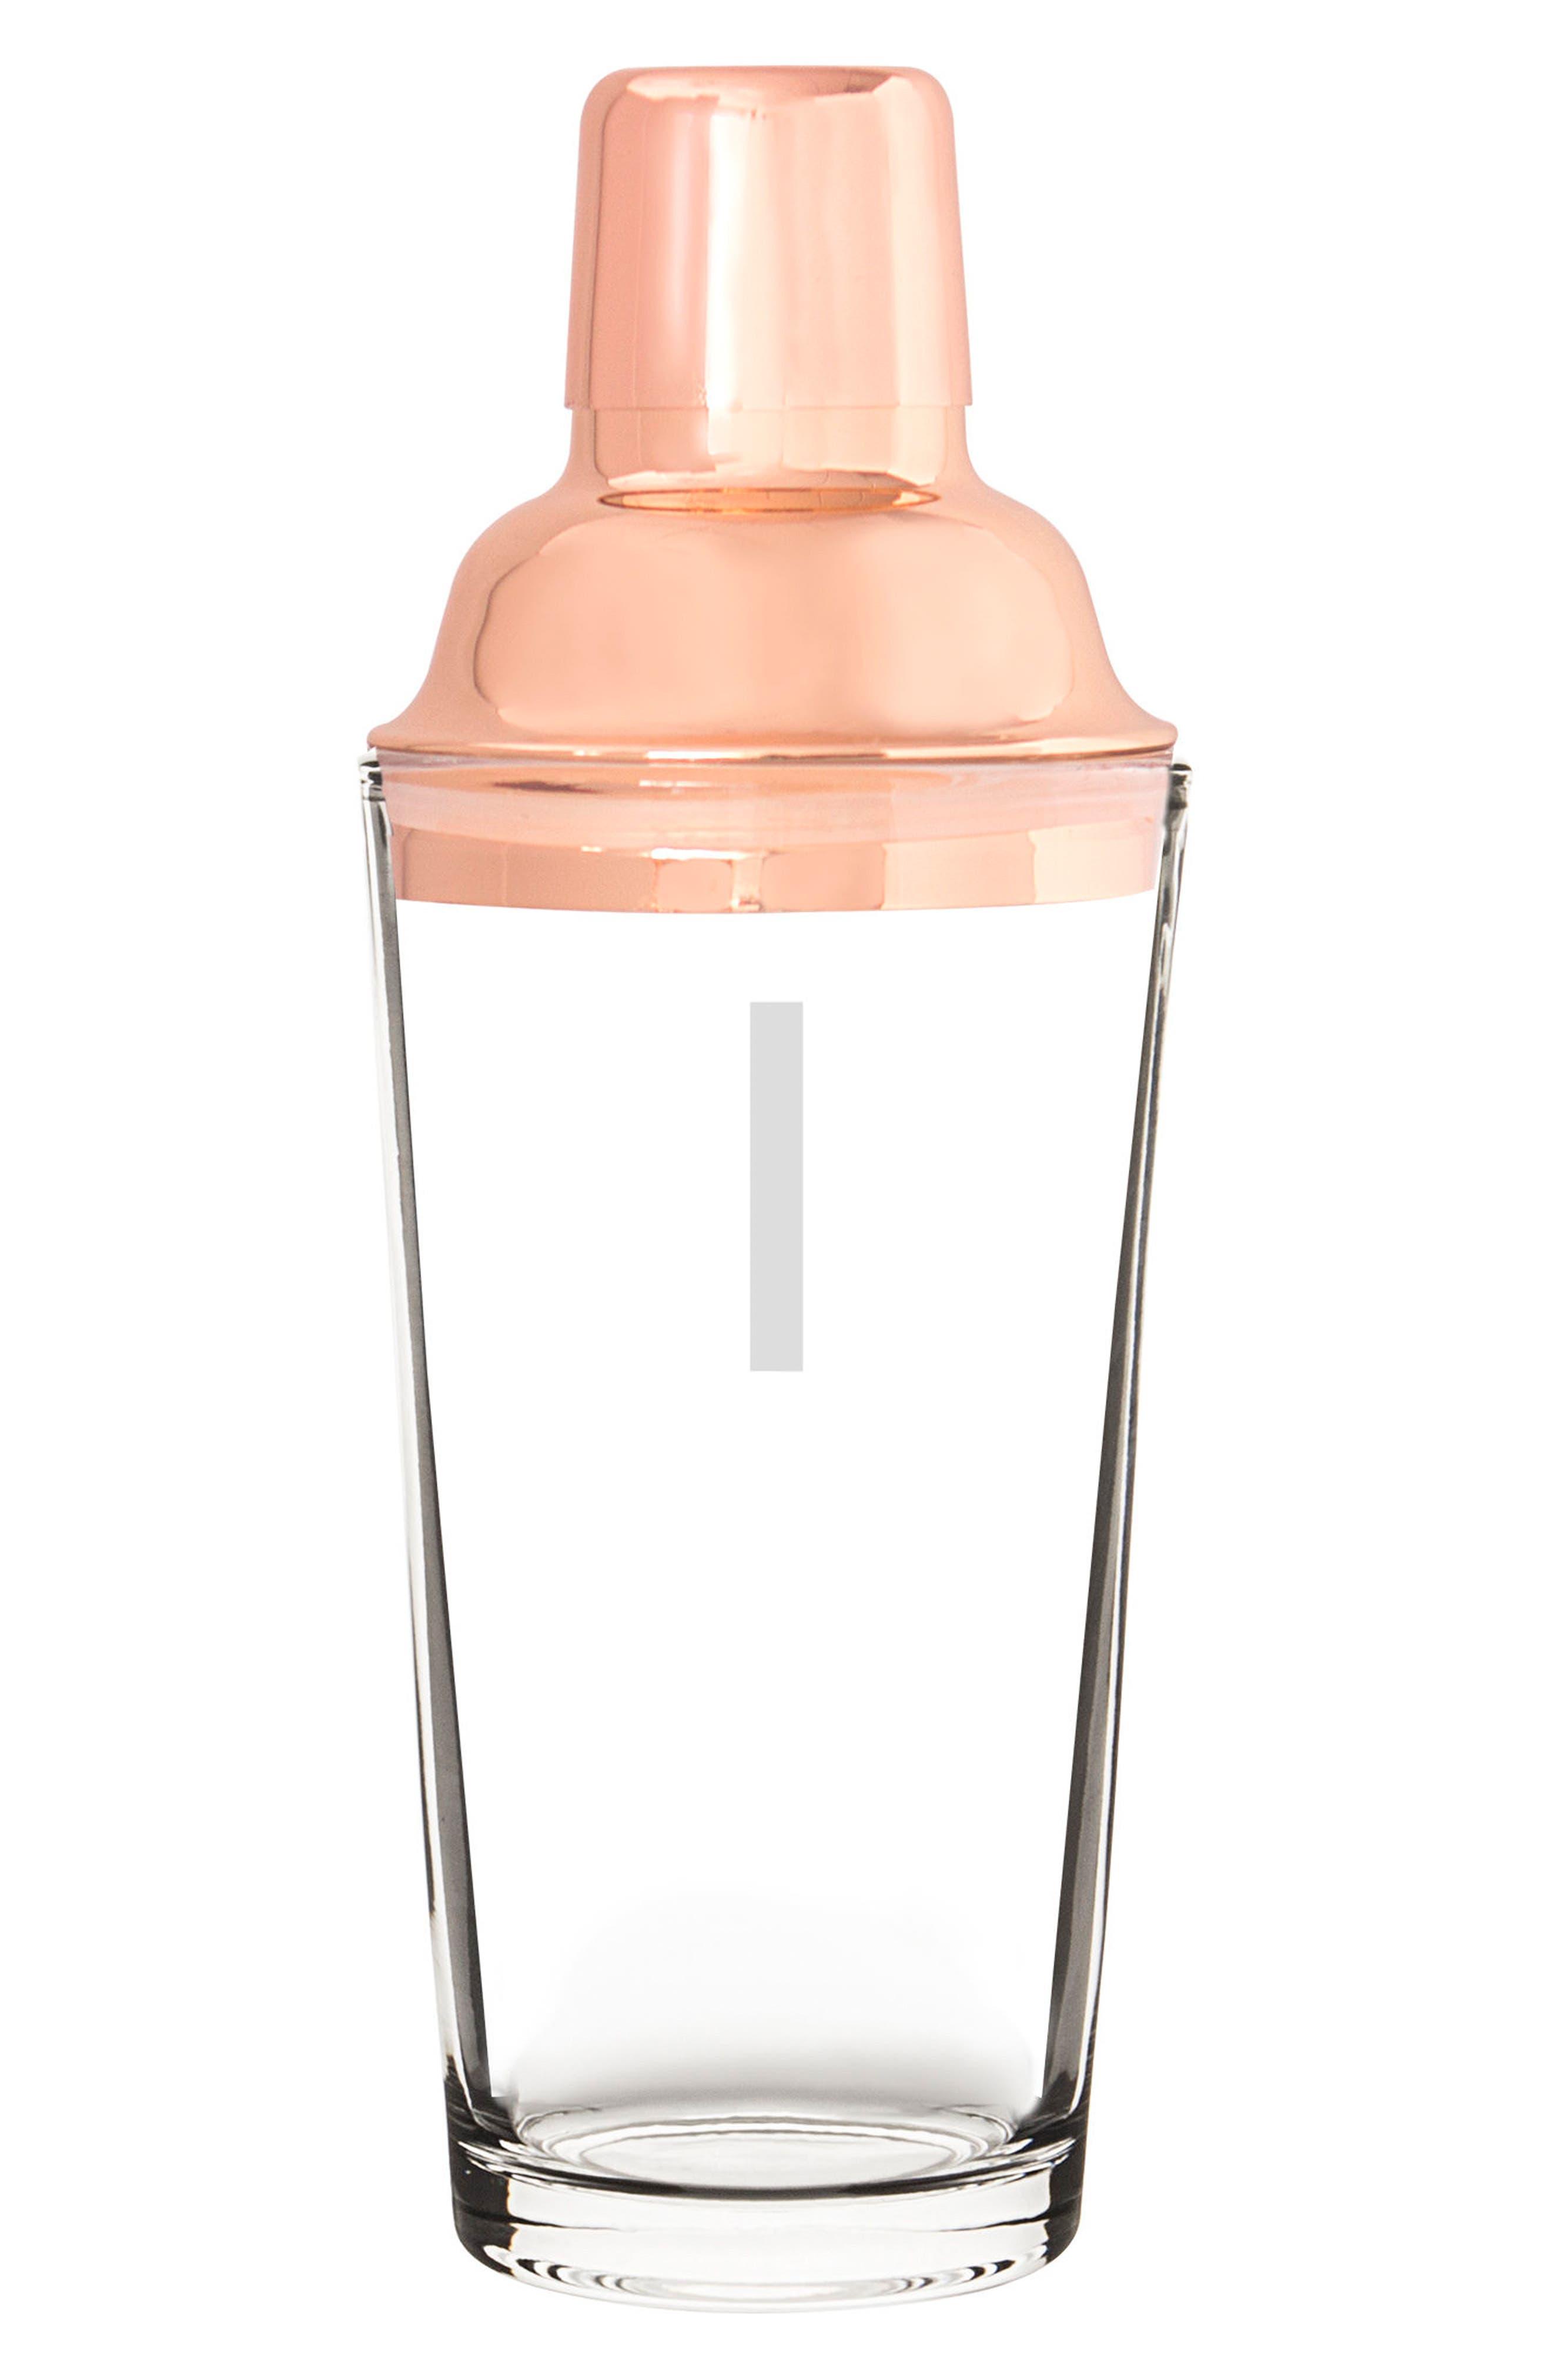 Monogram Coppertone Cocktail Shaker,                             Main thumbnail 10, color,